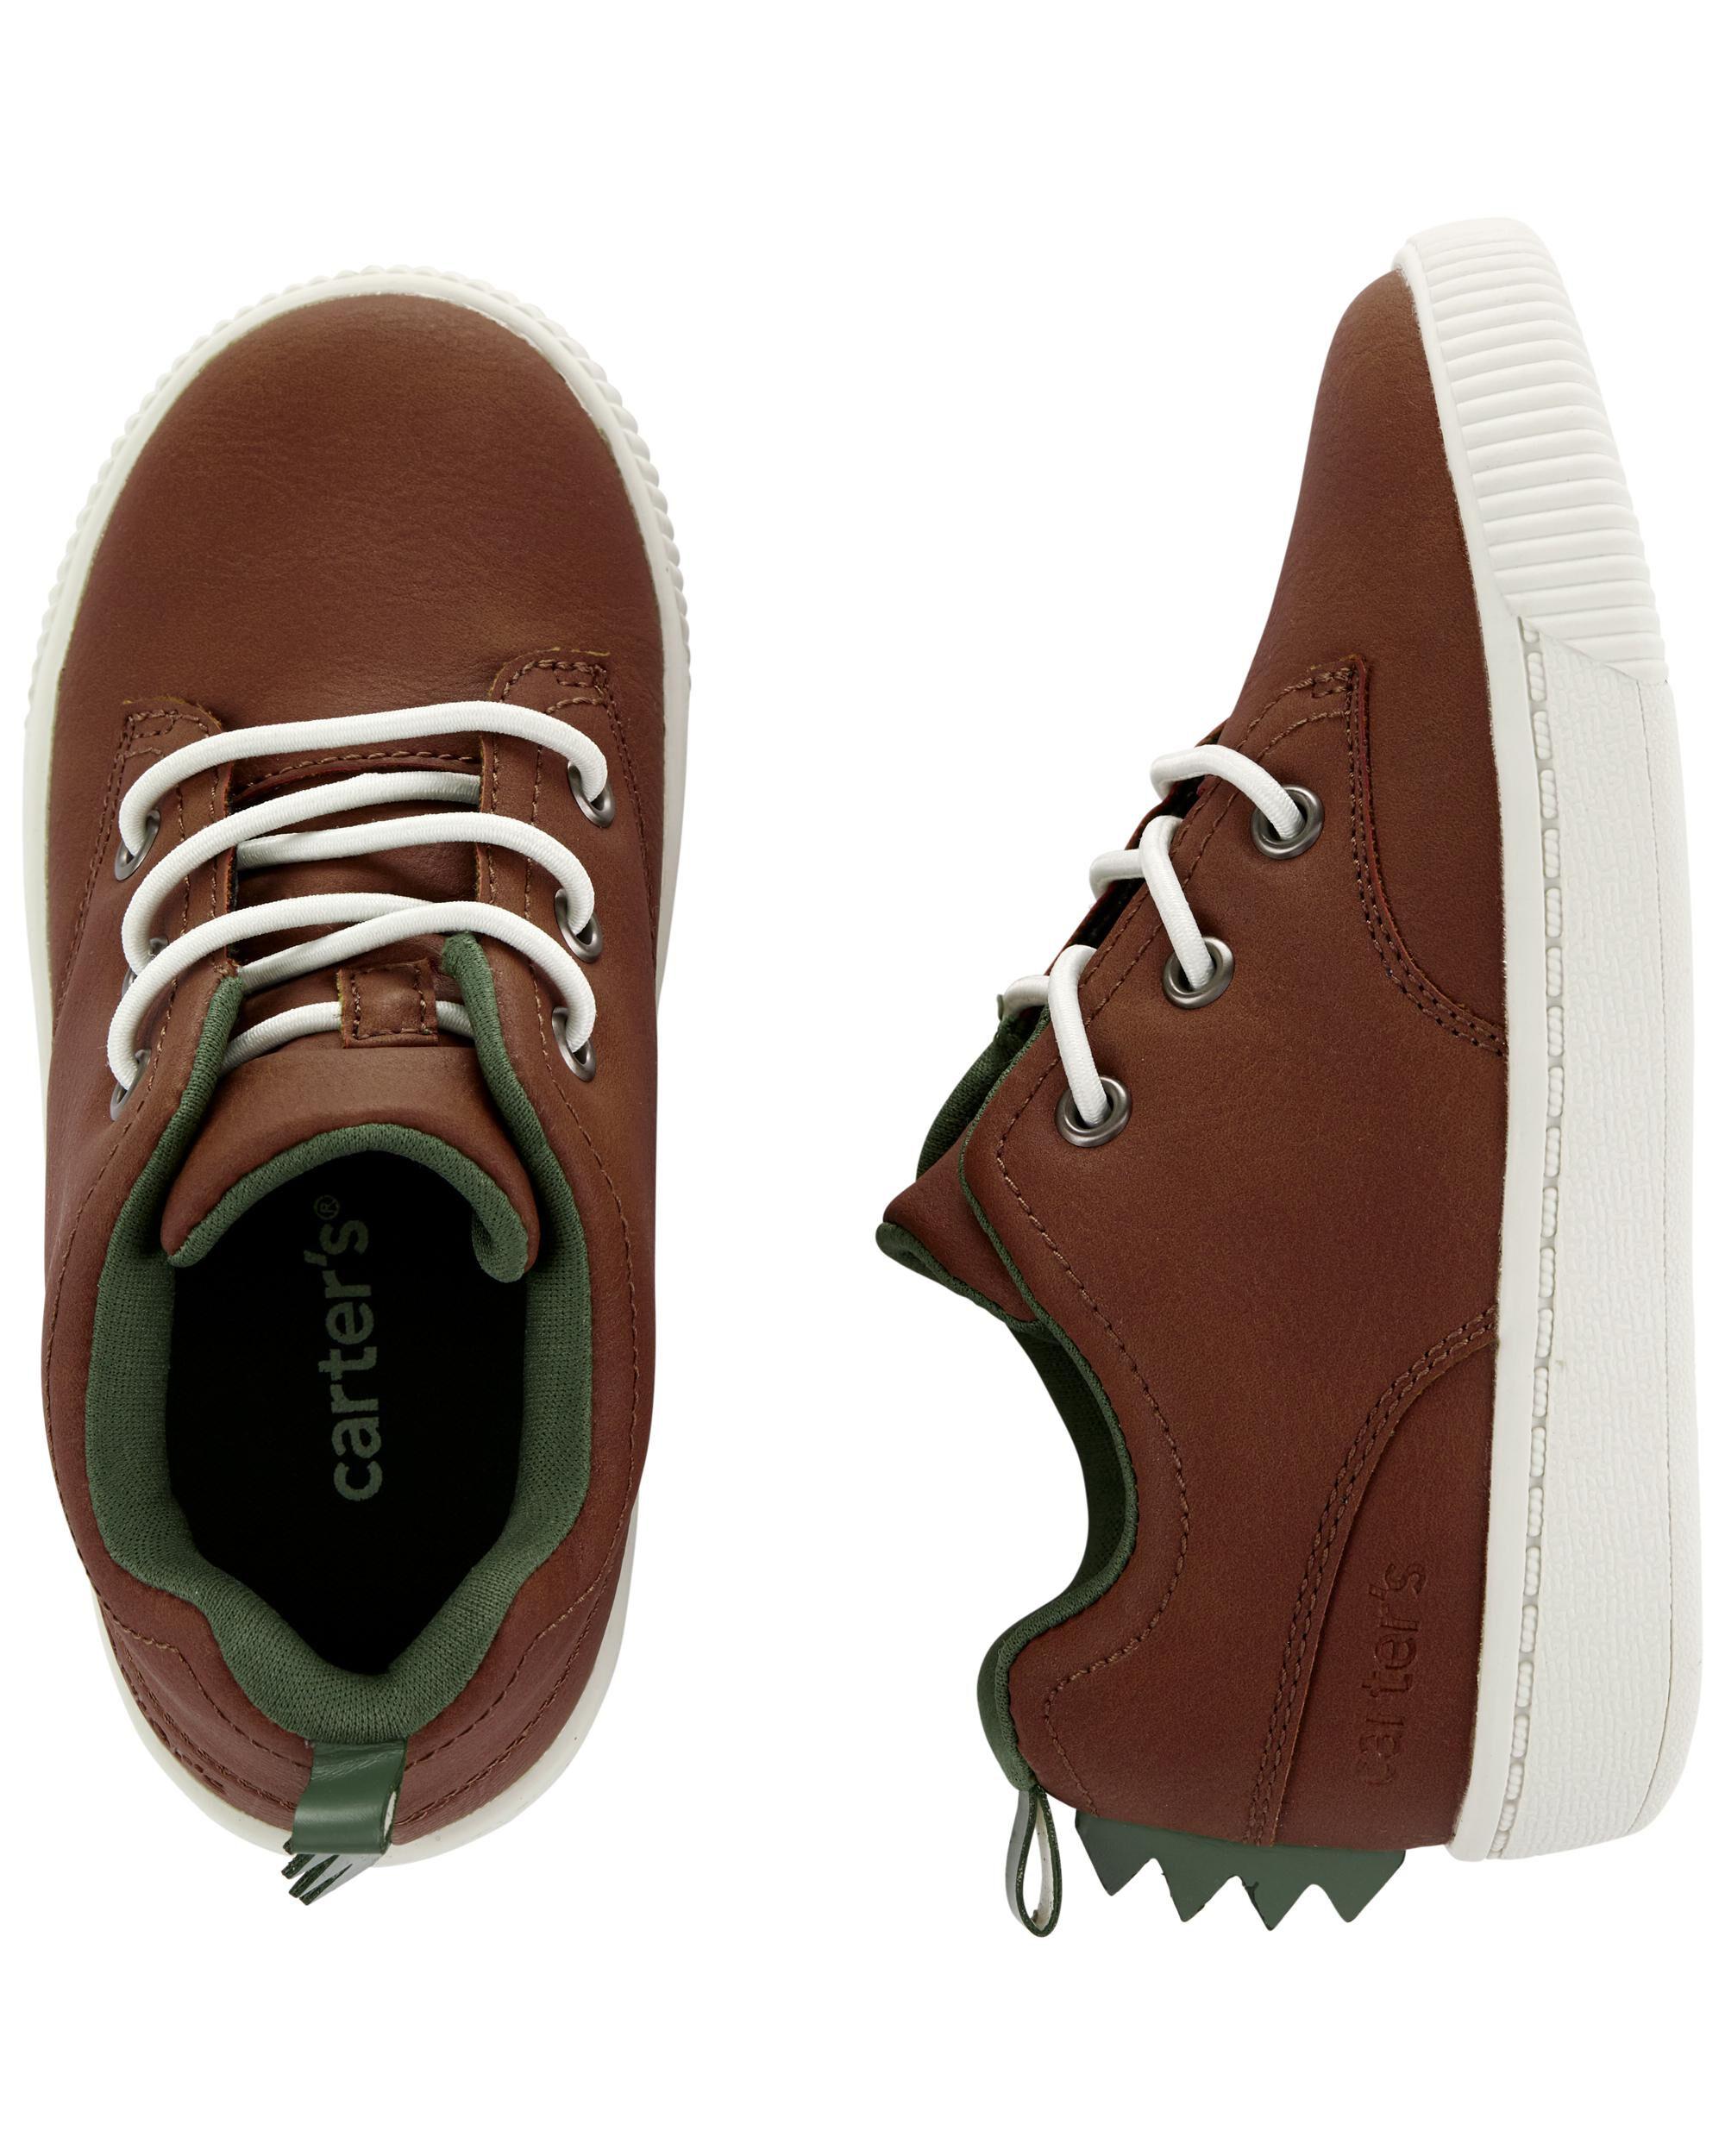 Carters High-Top Sneakers